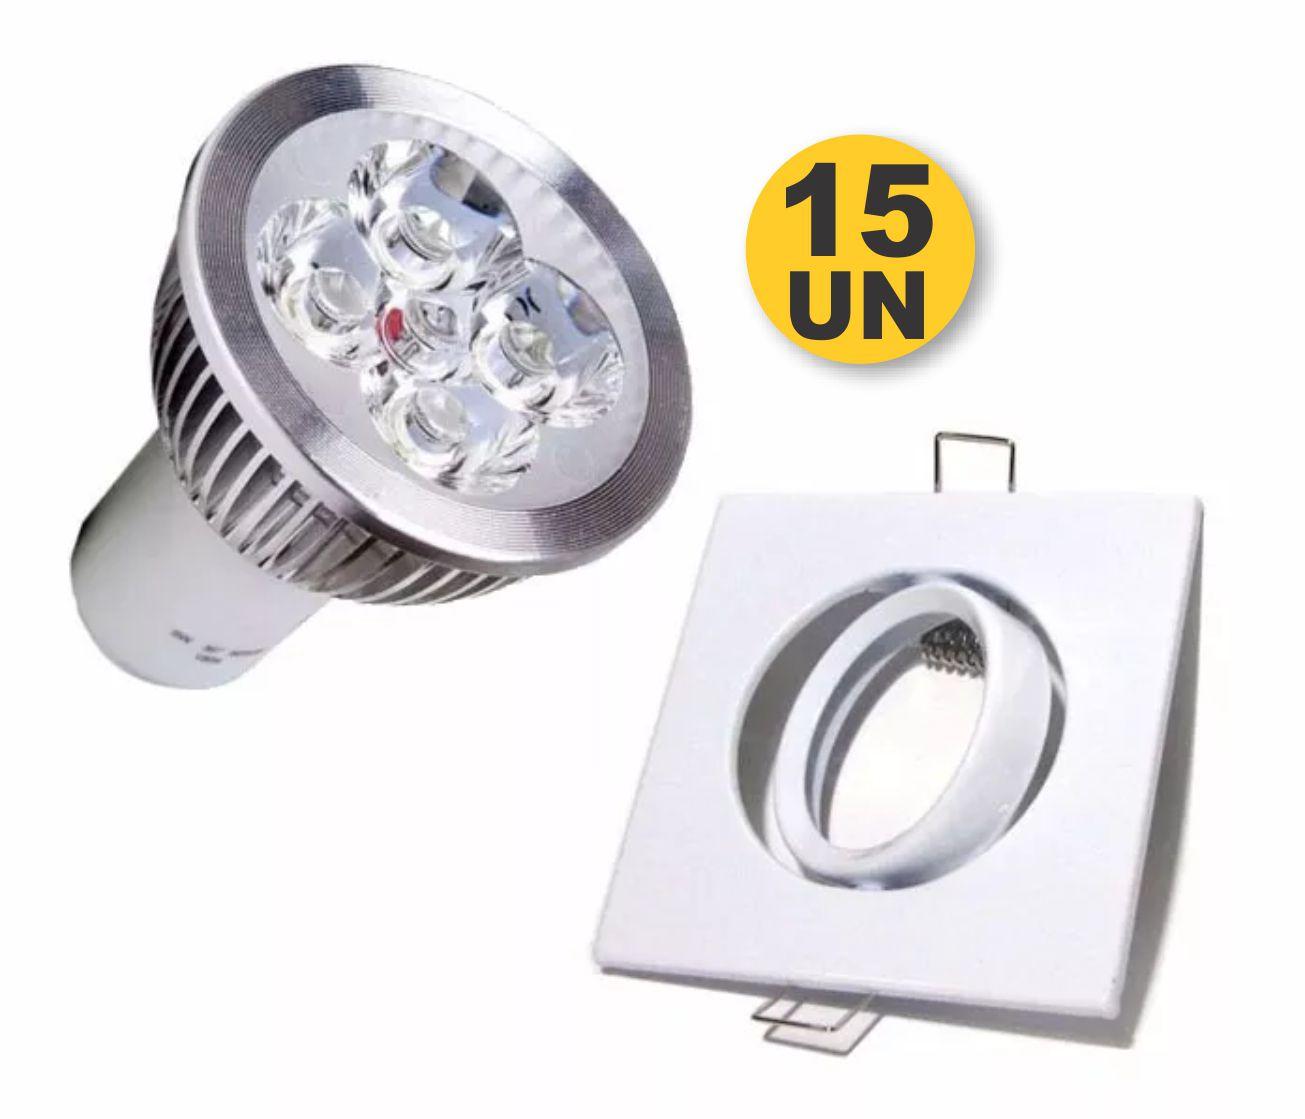 Kit 15x Spot Quadrado Branco + Lampada 5w 12V Branco Puro